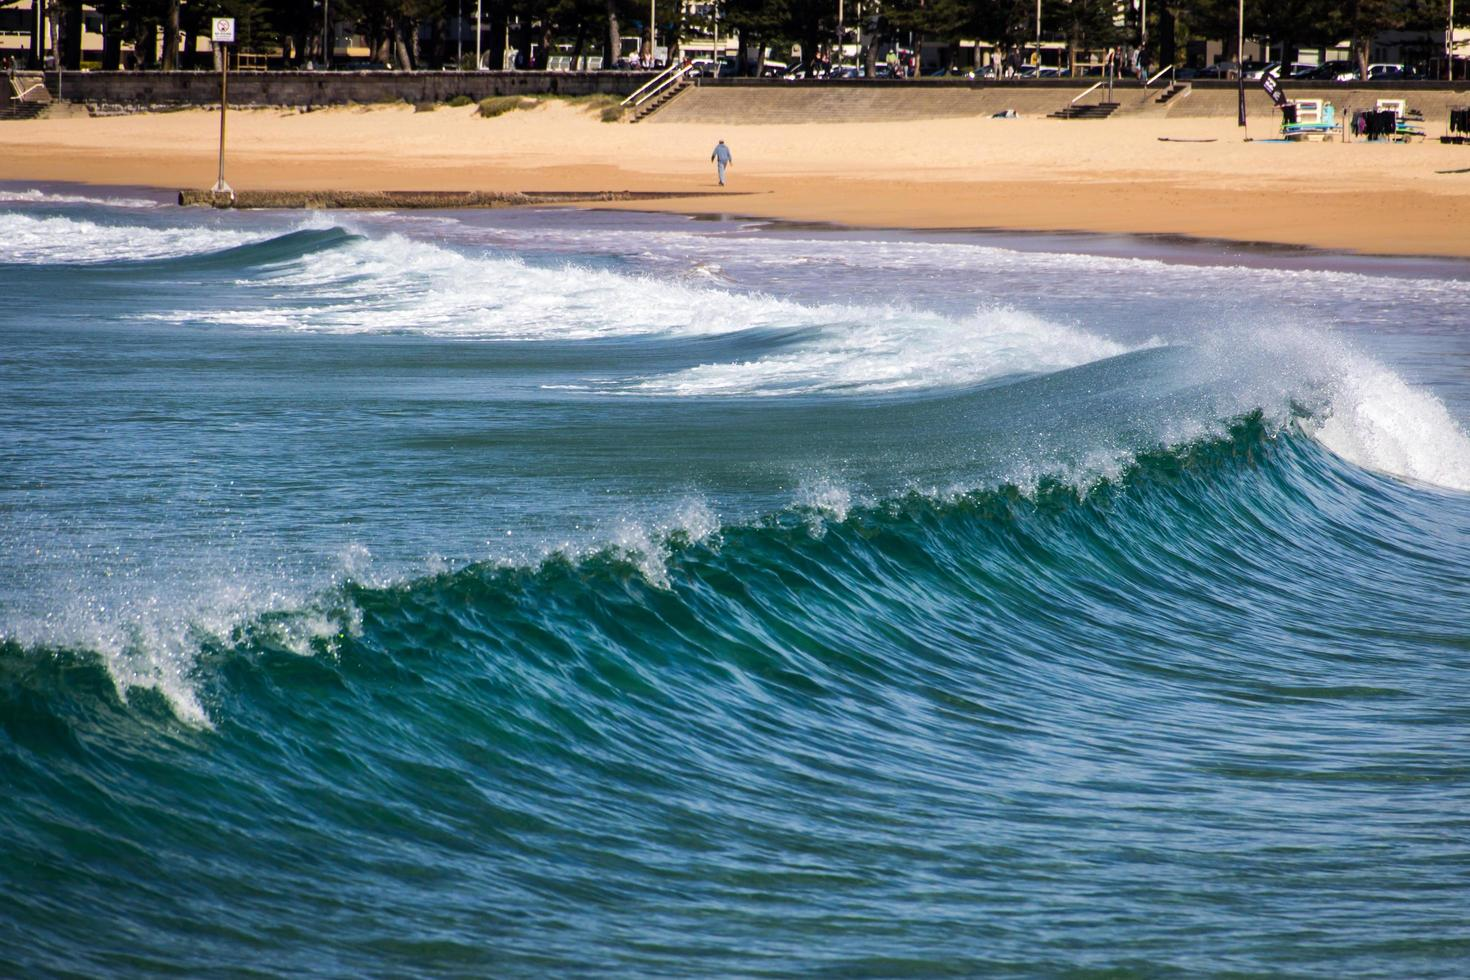 Manly Beach, Australia, 2020 - Waves near beach during the day photo